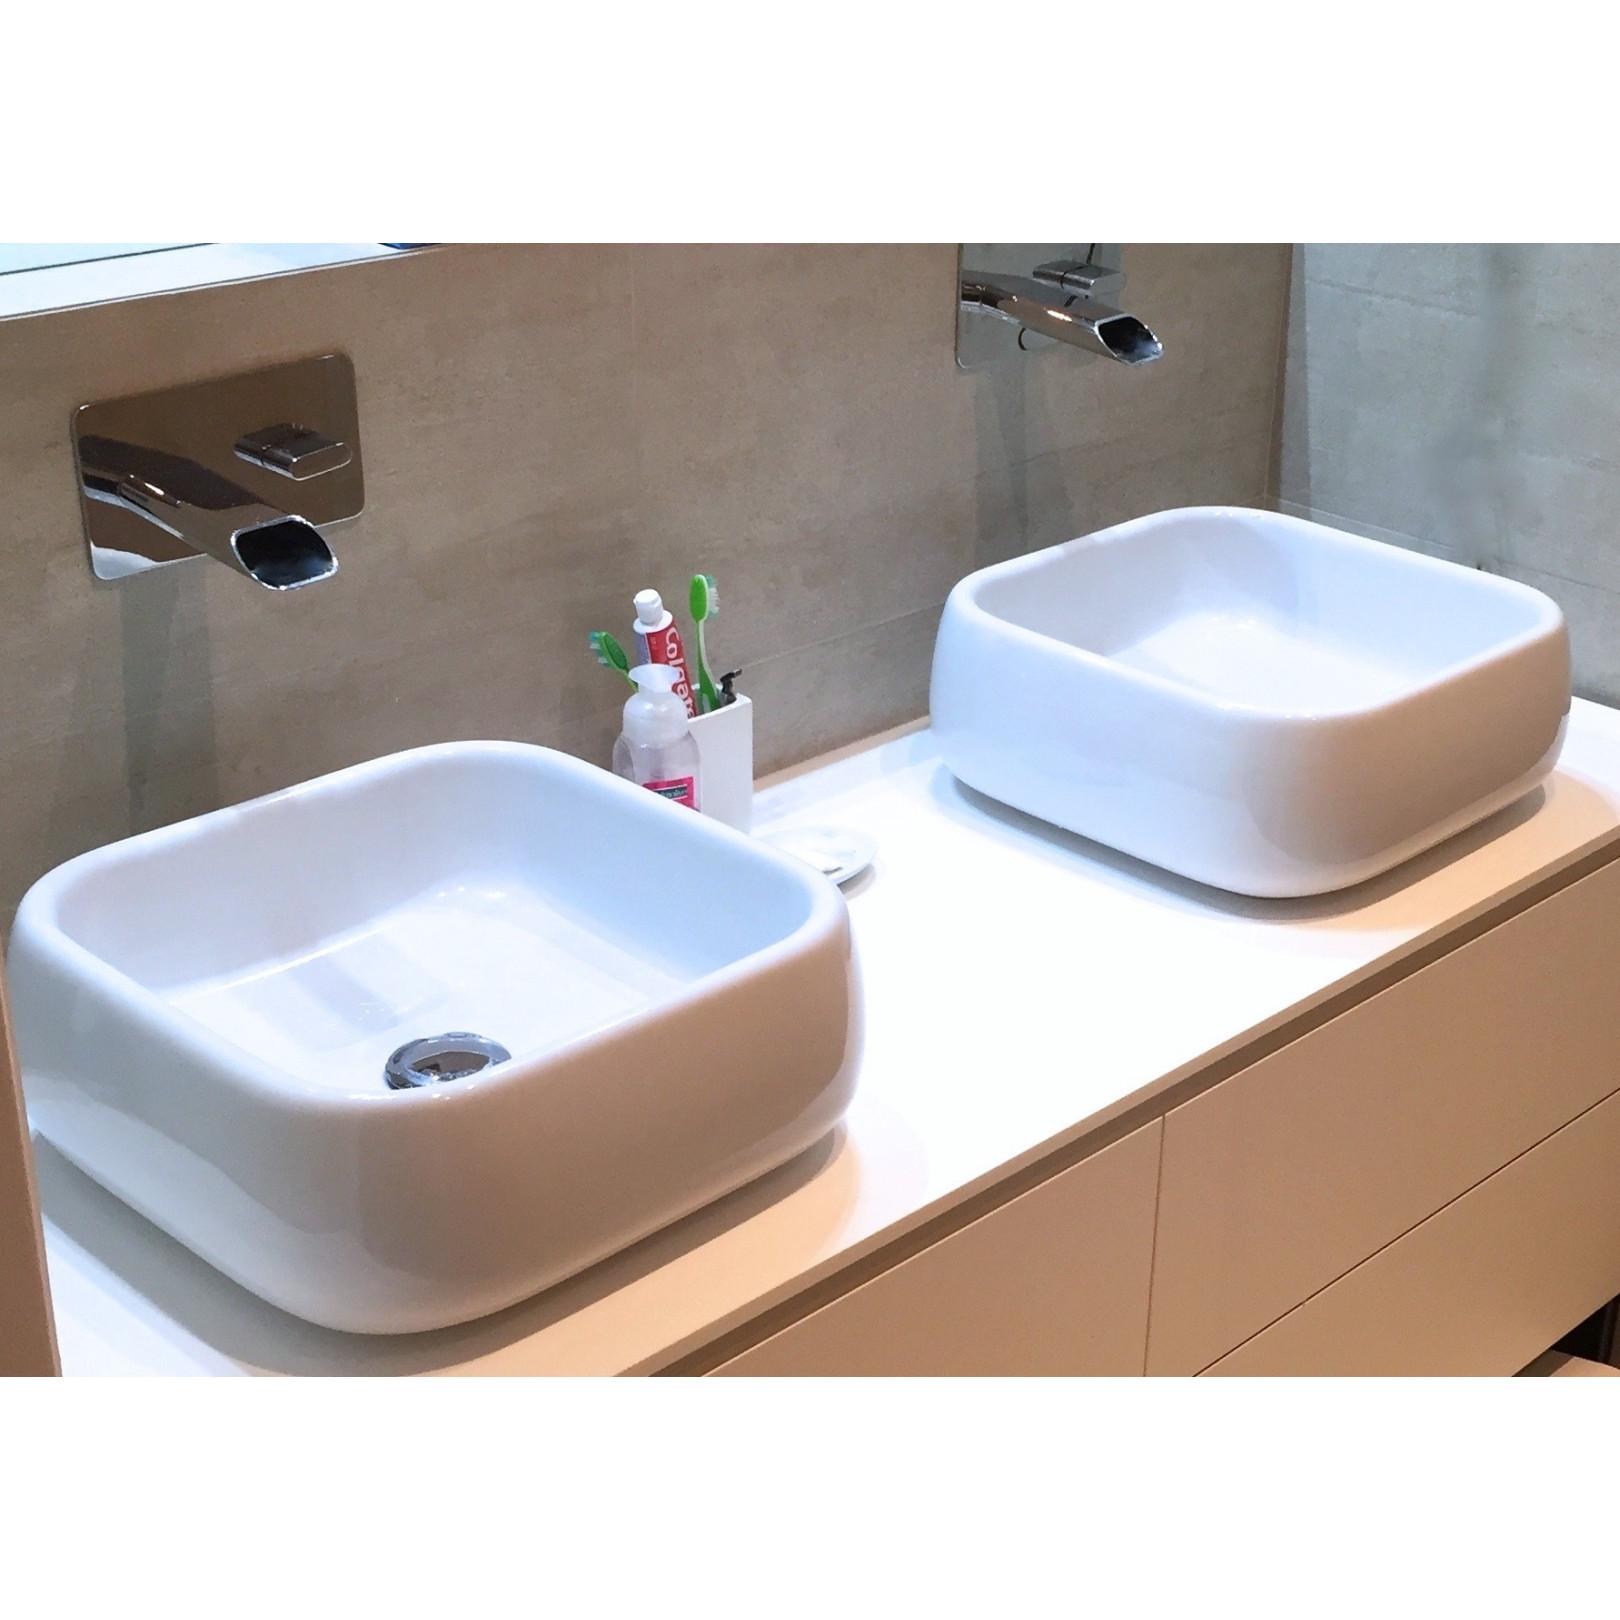 Lavabo Vasque à Poser Shui40 Casalux Home Design